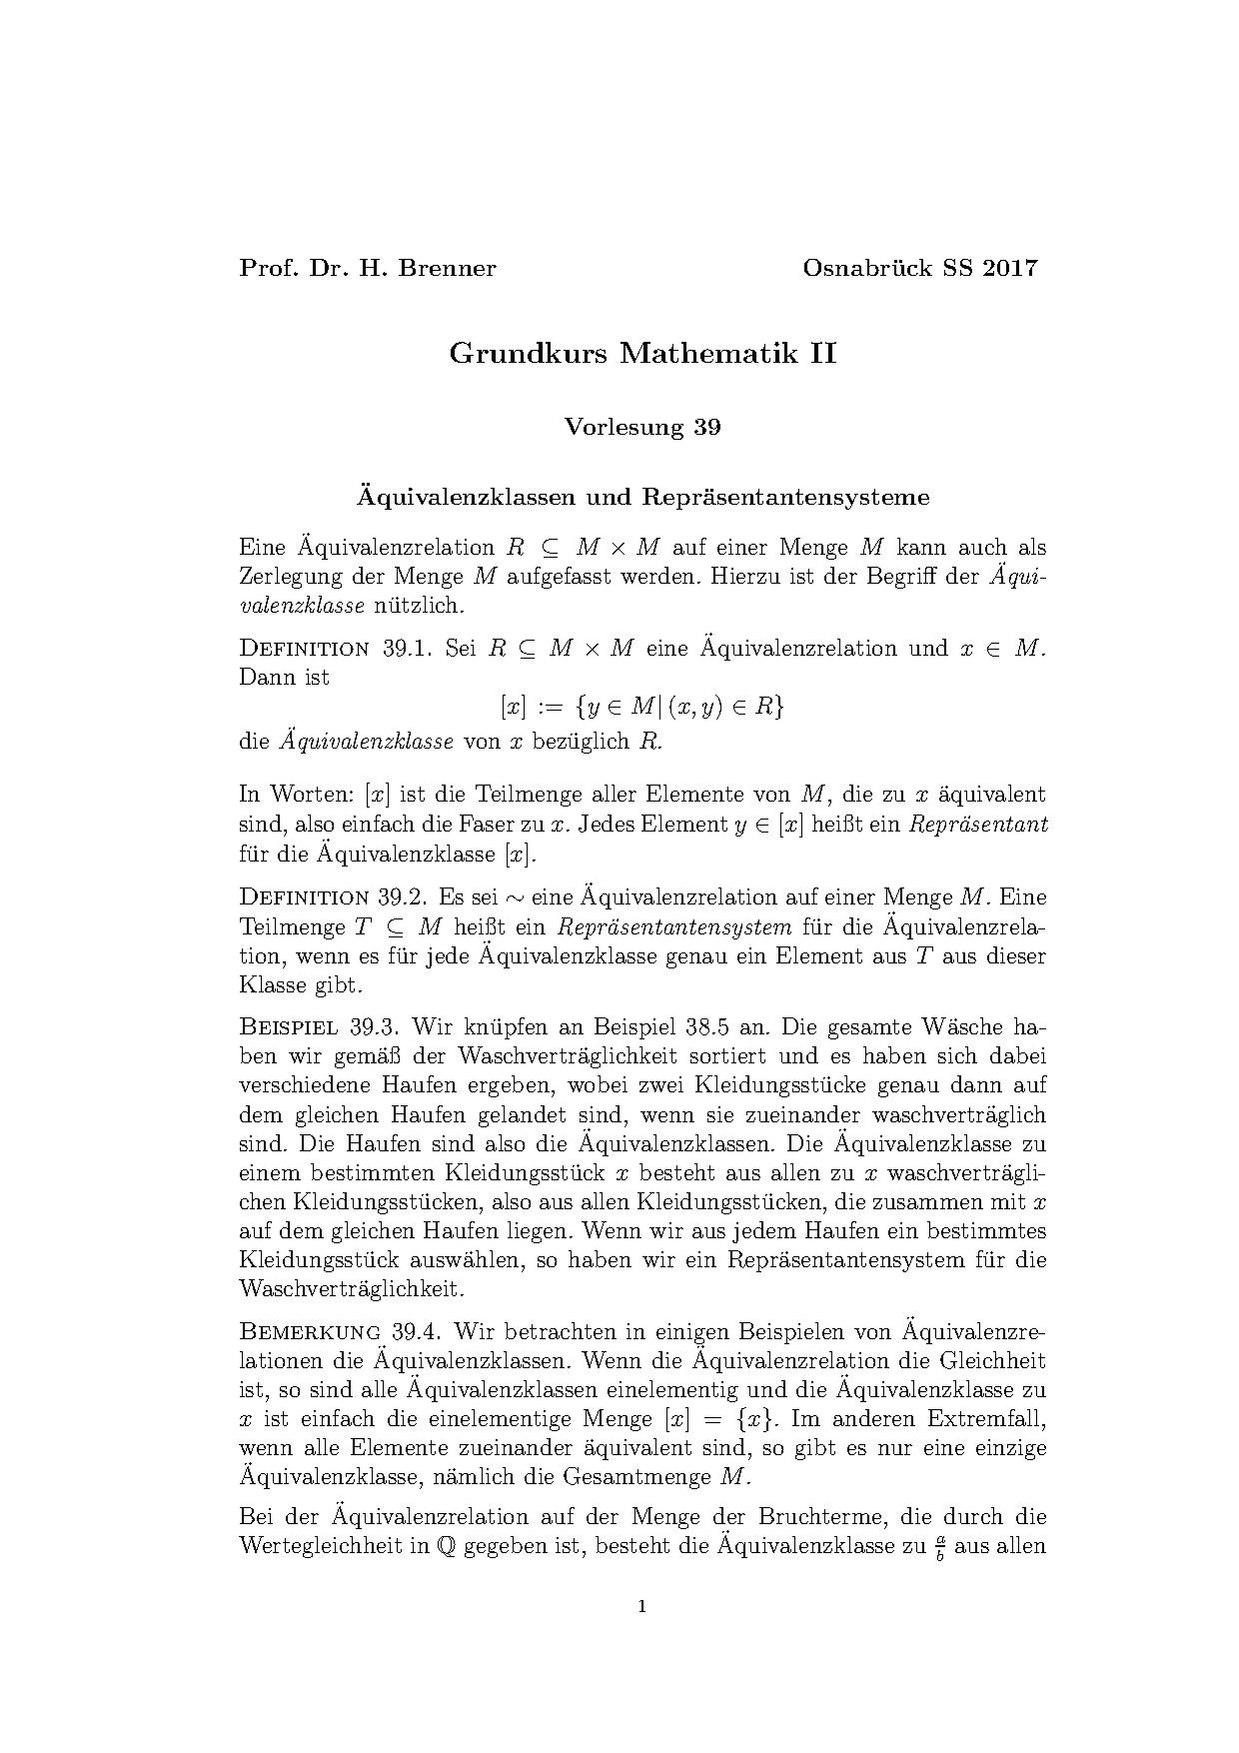 File:Grundkurs Mathematik (Osnabrück 2016-2017)Teil IIVorlesung39 ...